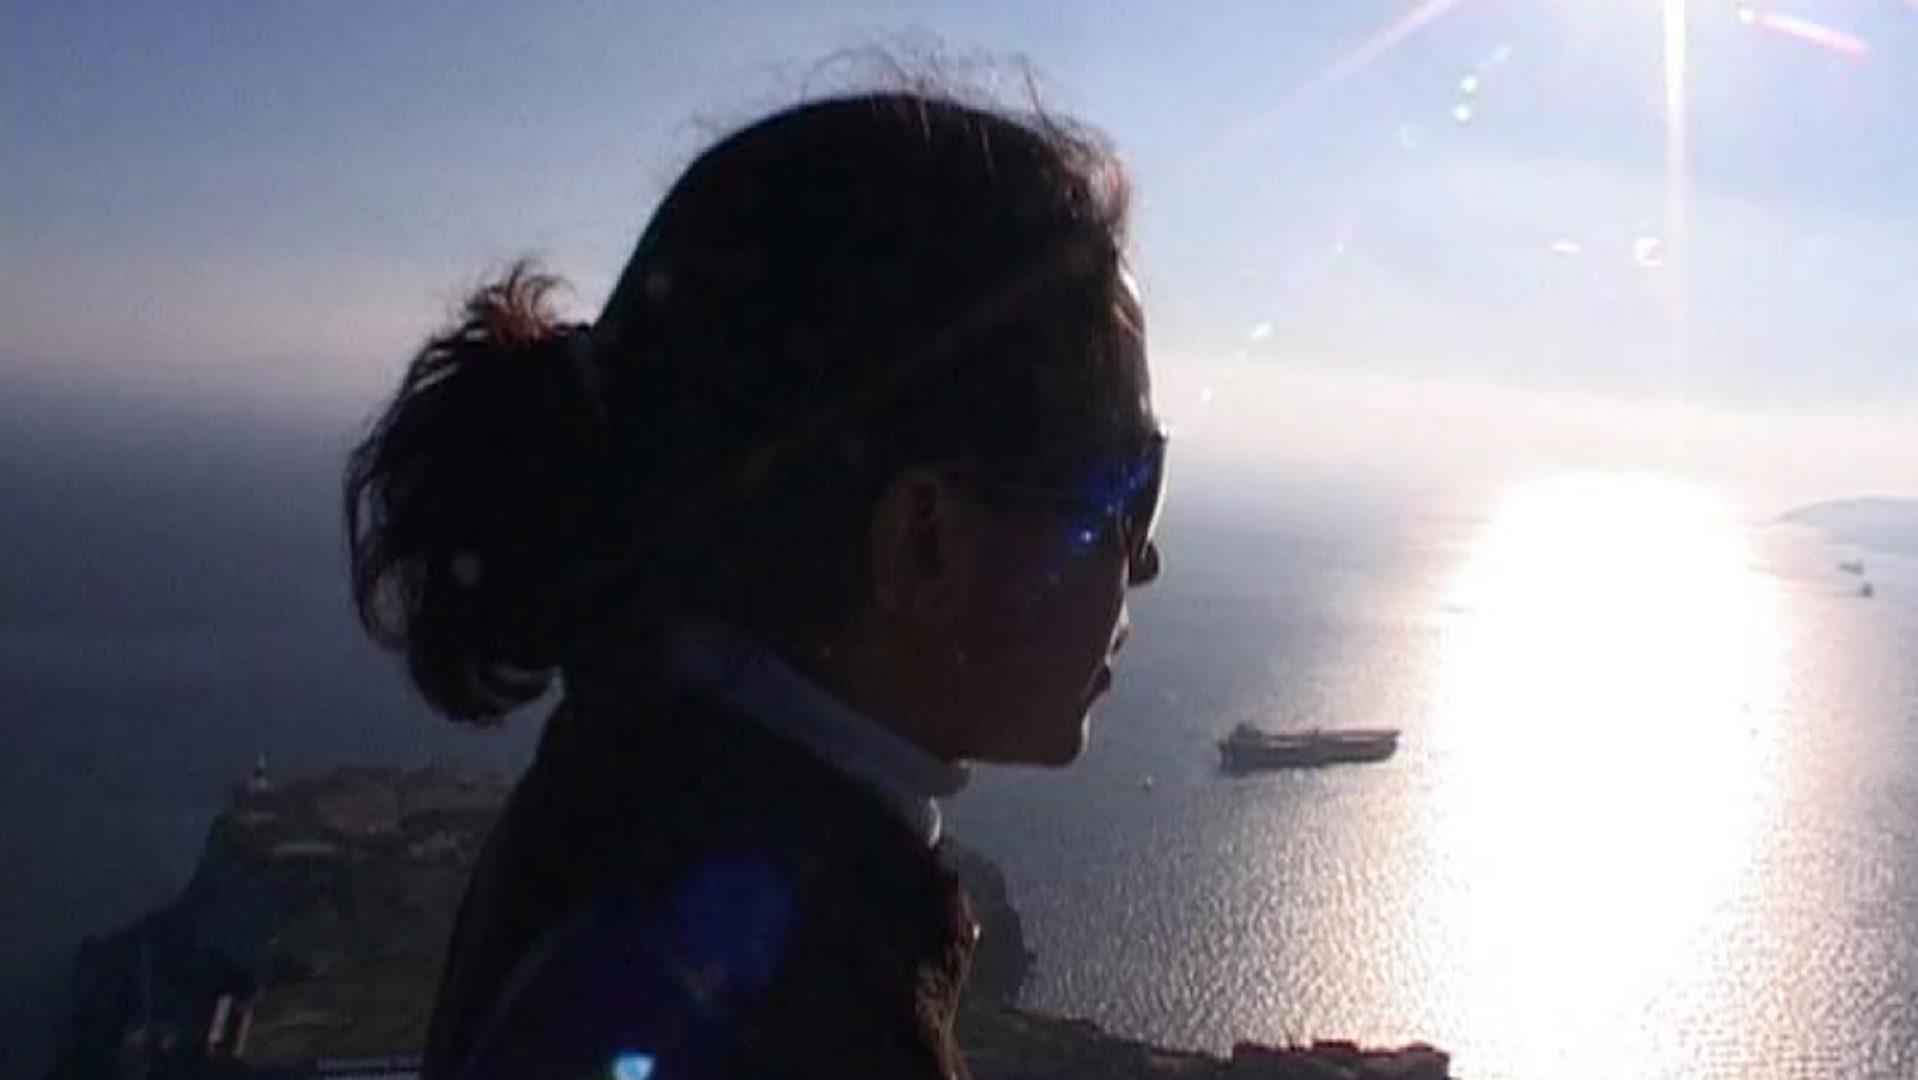 Image for: Confini d'Europa #1 Ceuta e Gibilterra